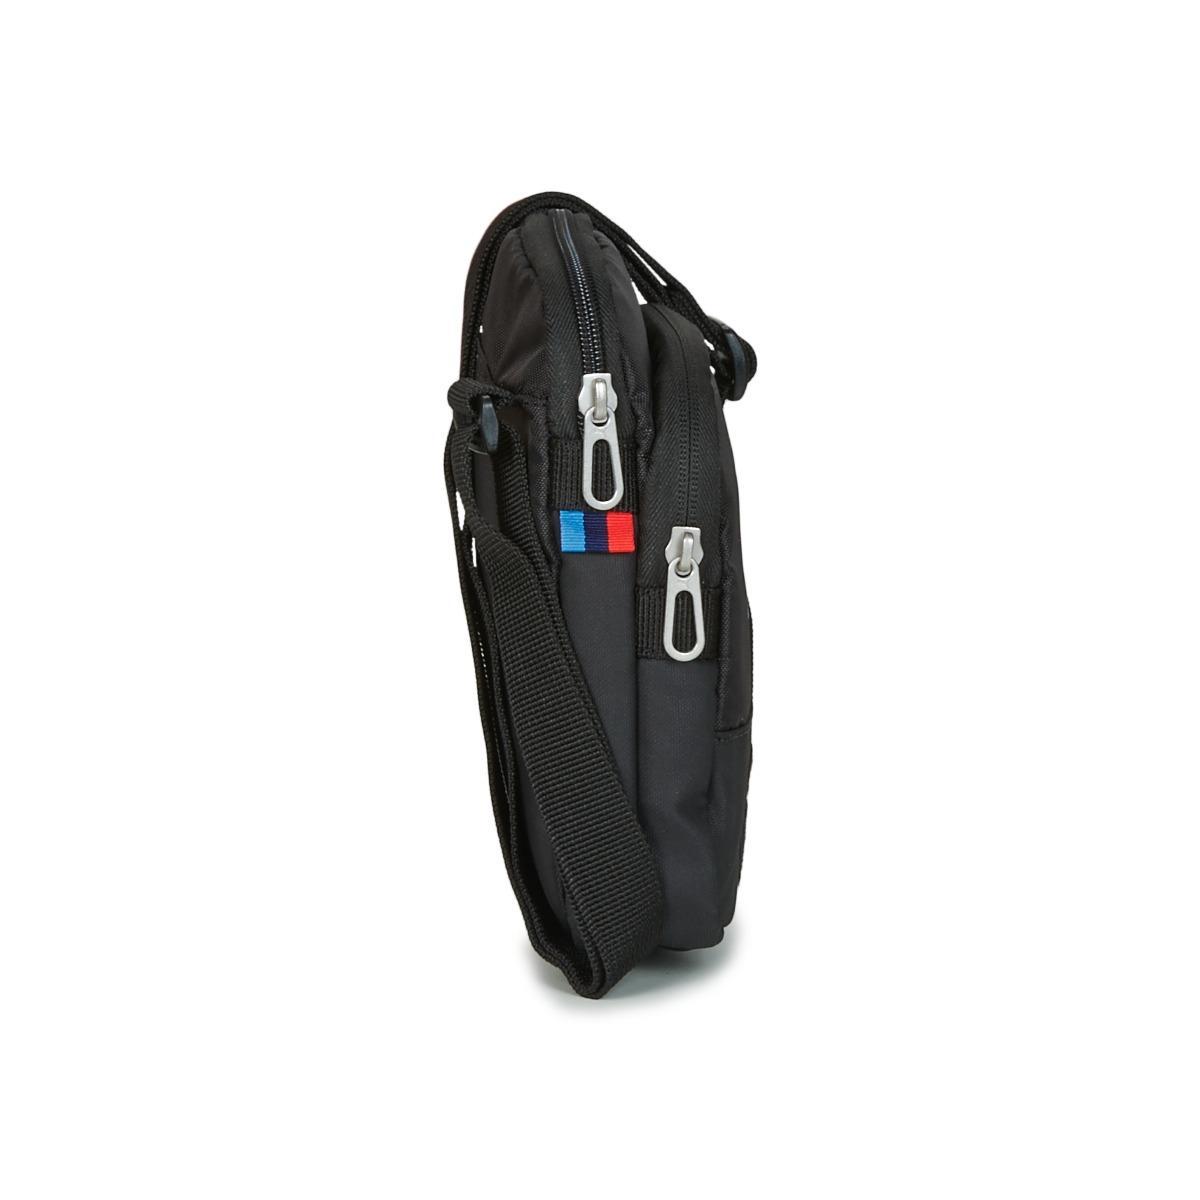 PUMA - Bmw Small Portable Men s Pouch In Black for Men - Lyst. View  fullscreen a90ef85e09870